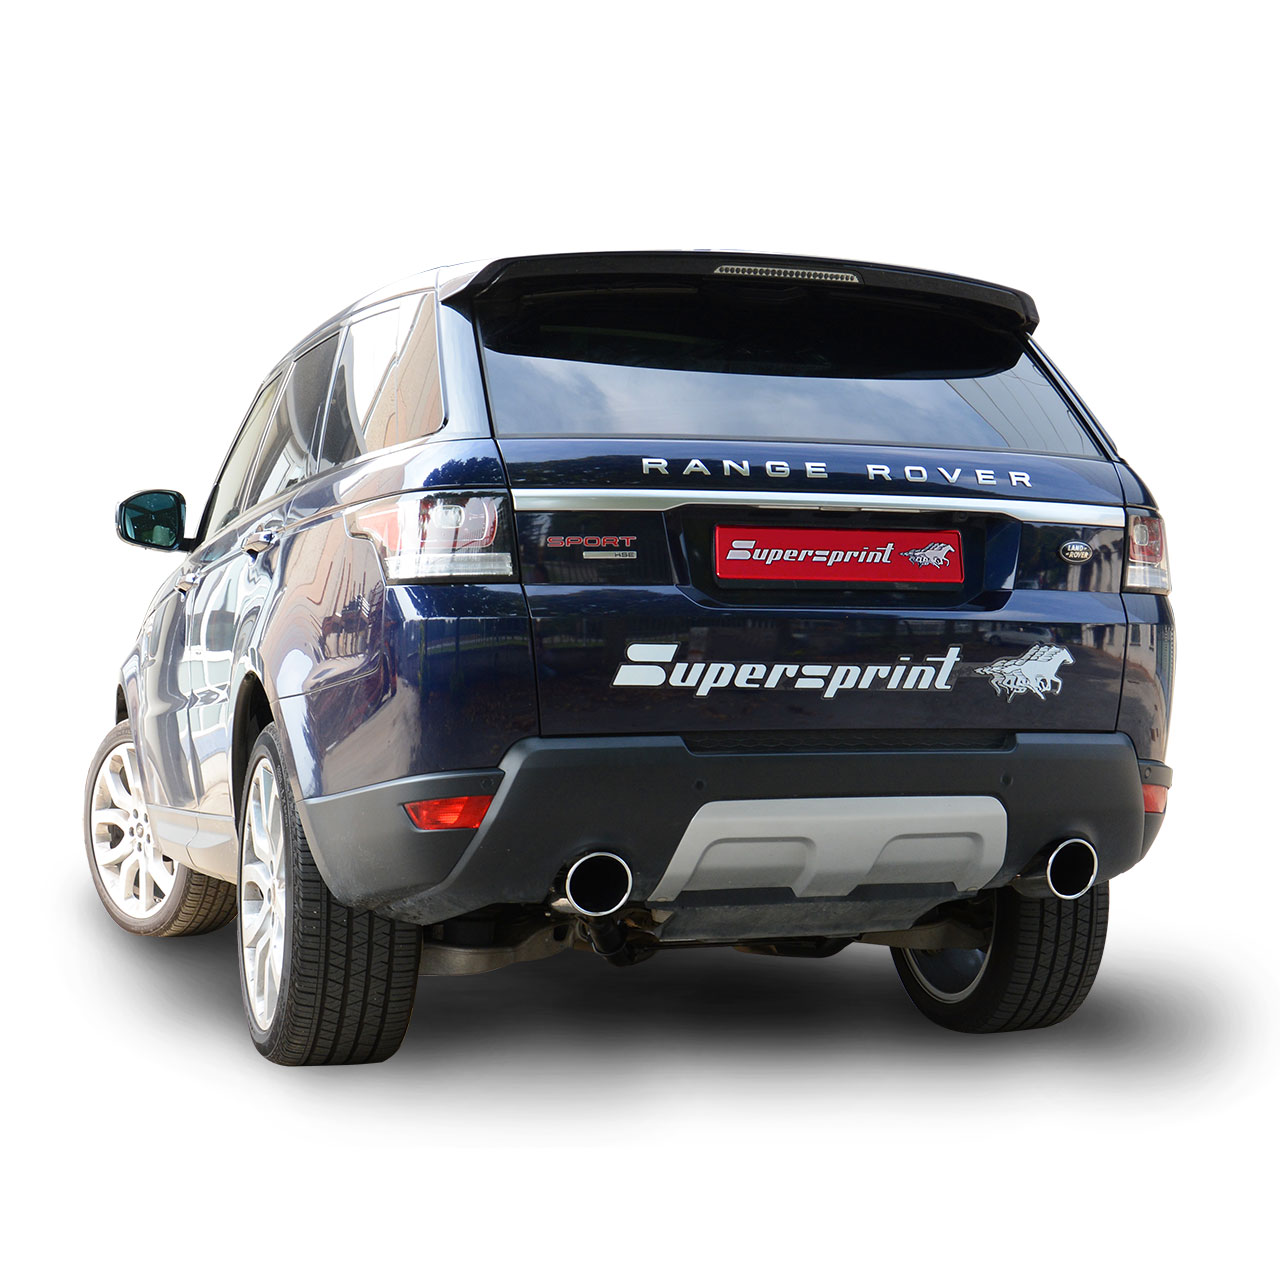 RANGE ROVER SPORT 3.0 SD V6 (306 Hp) 2017 ->, Land Rover